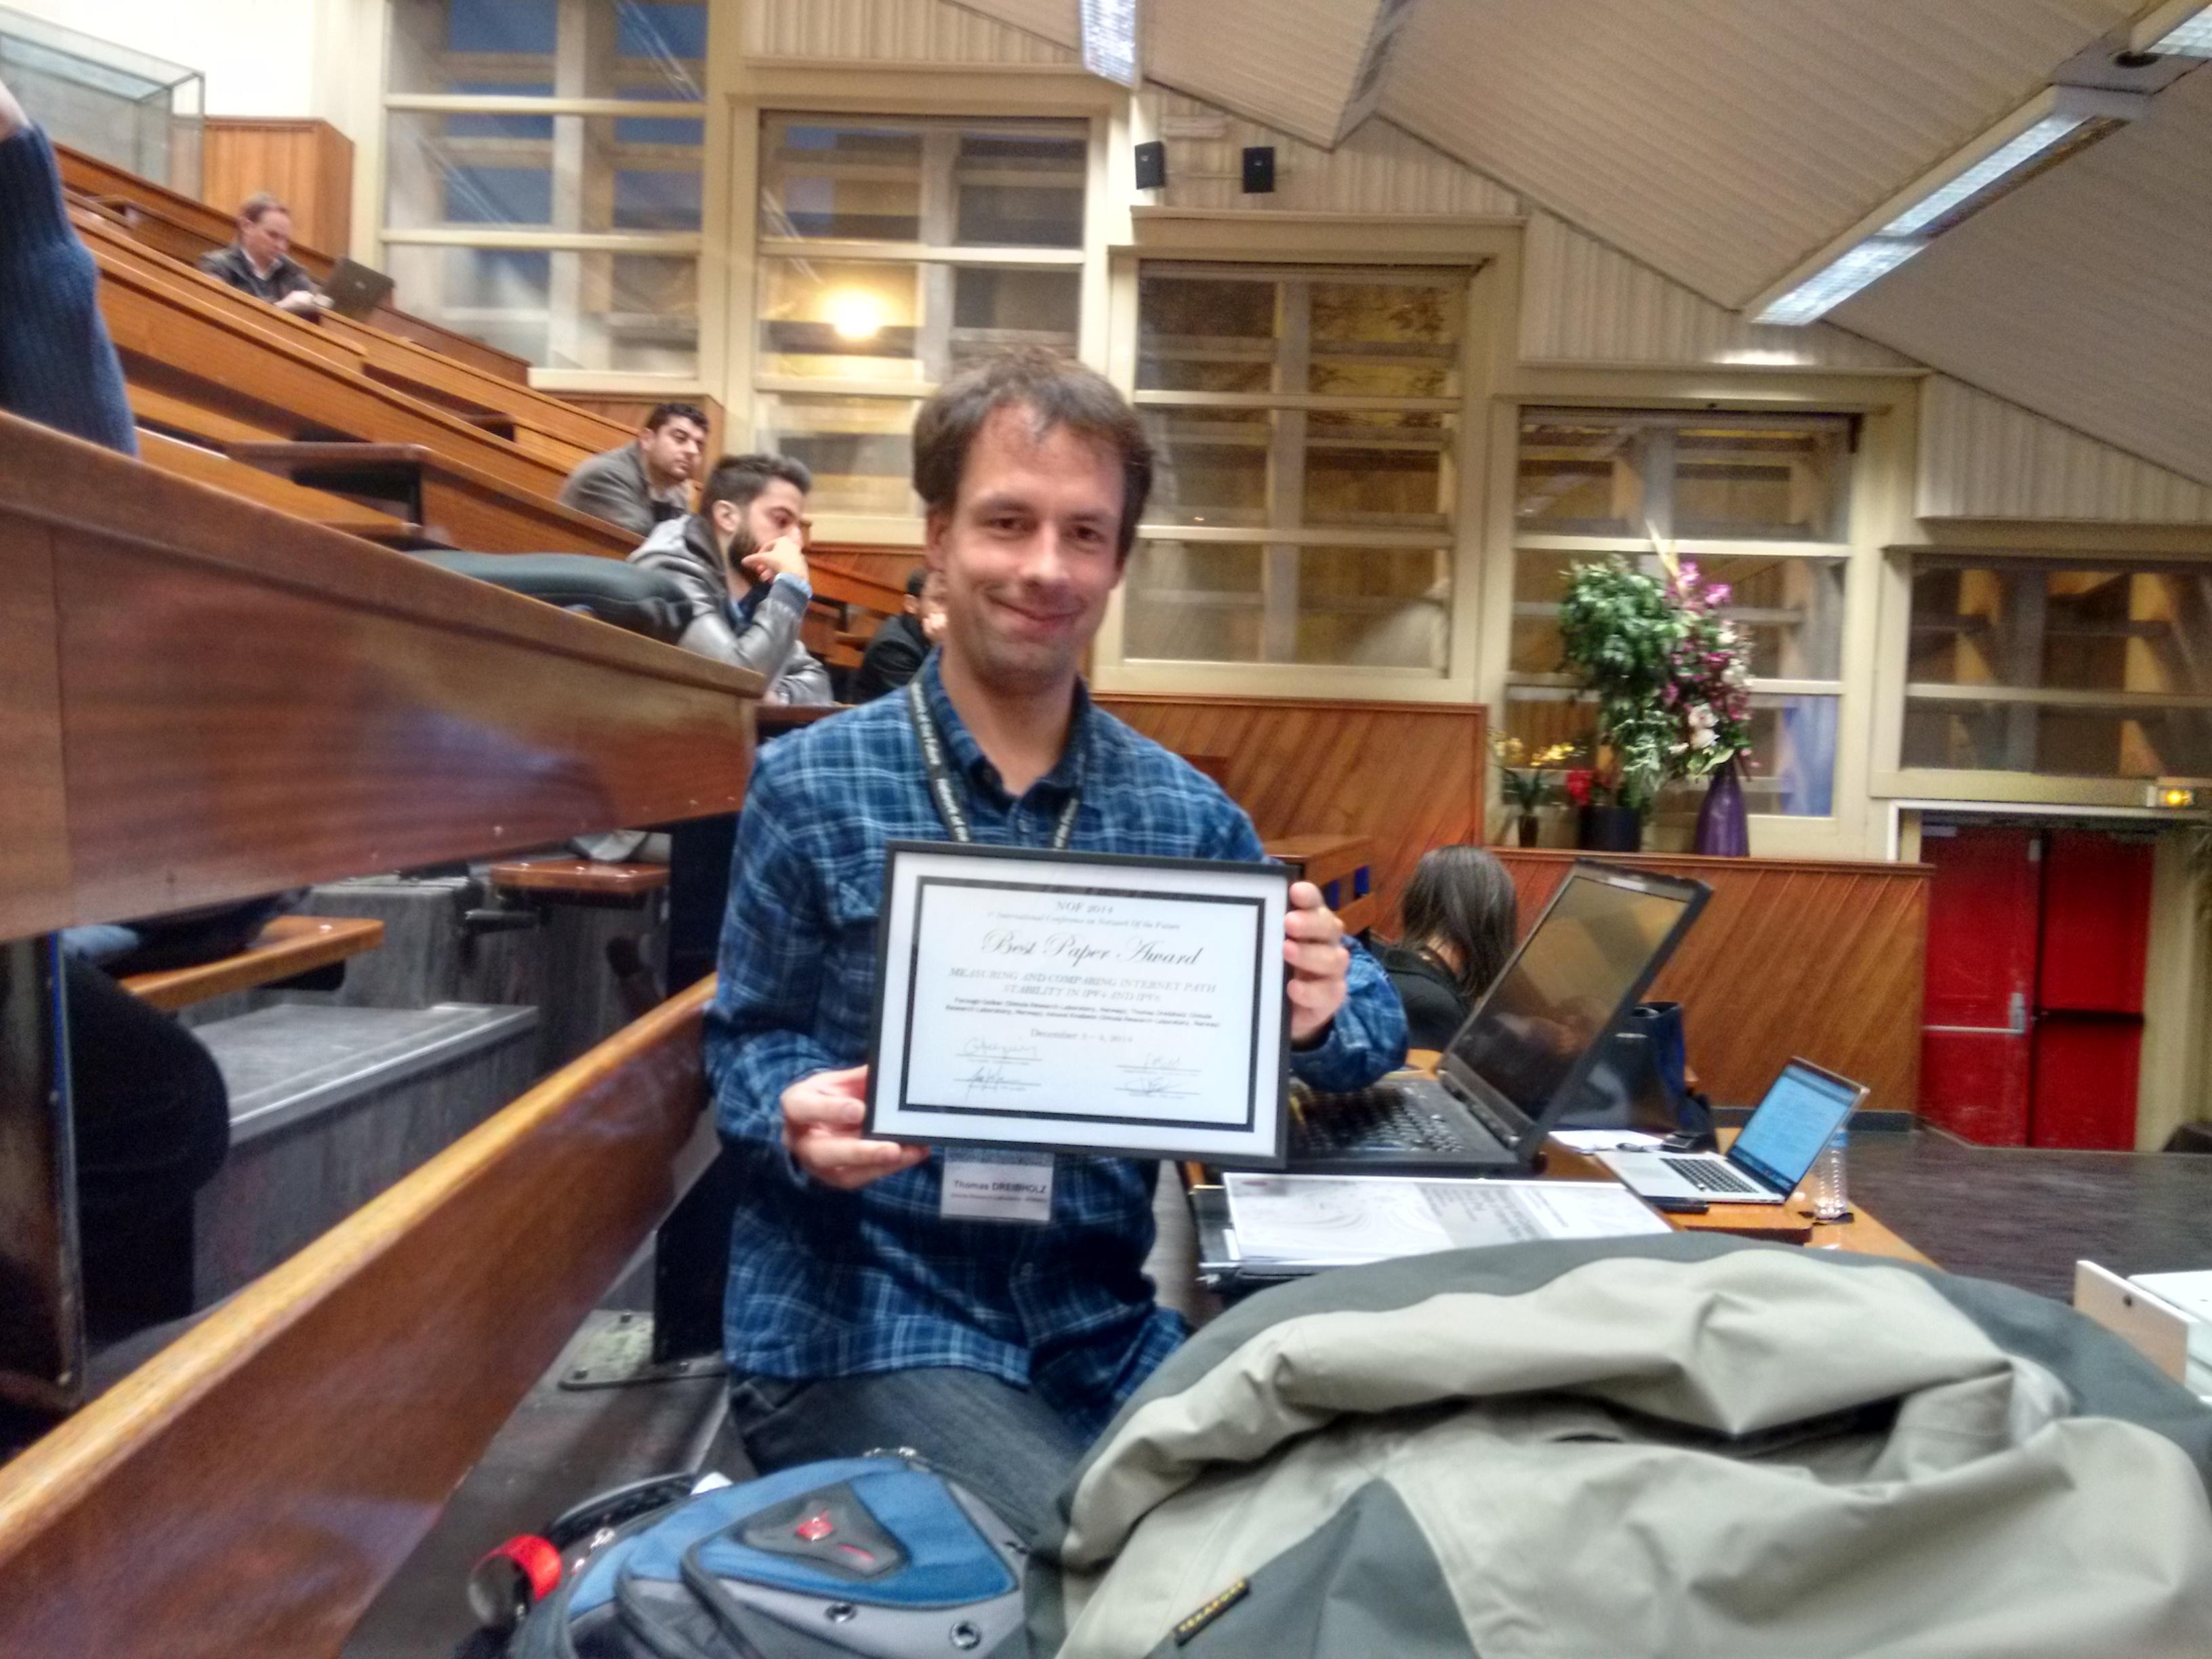 NoF 2014 Best Paper Award 1